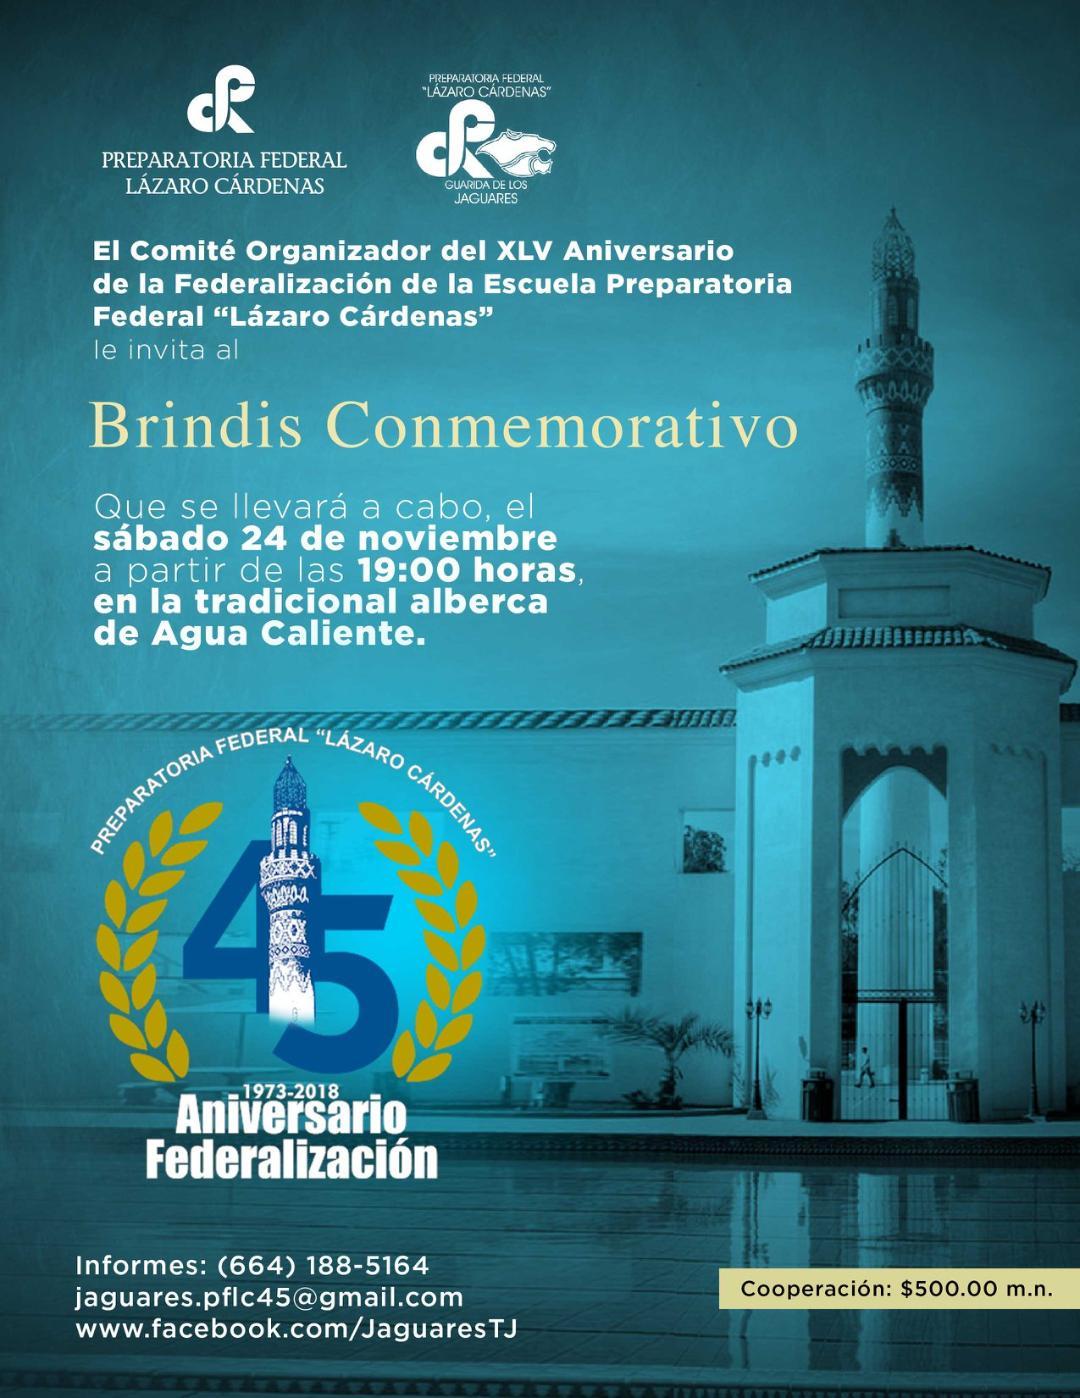 PREPARATORIA FEDERAL LÁZARO CÁRDENAS   CELEBRARÁ 45º ANIVERSARIO